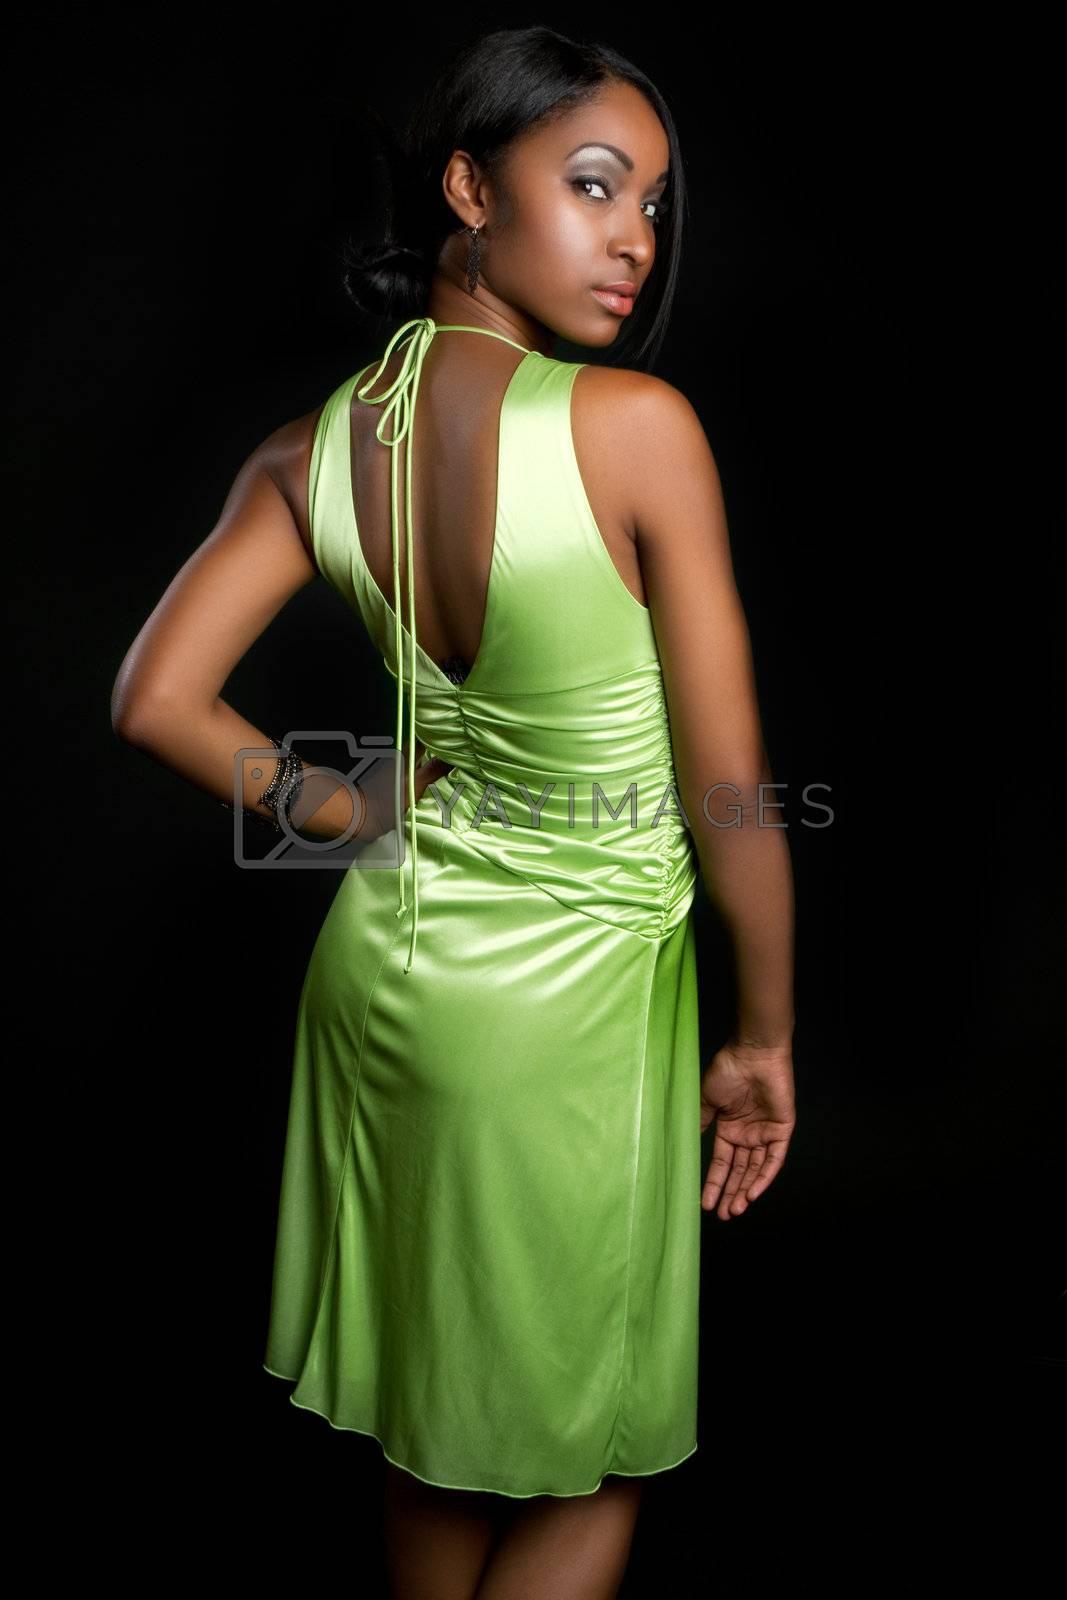 Beautiful black woman wearing dress